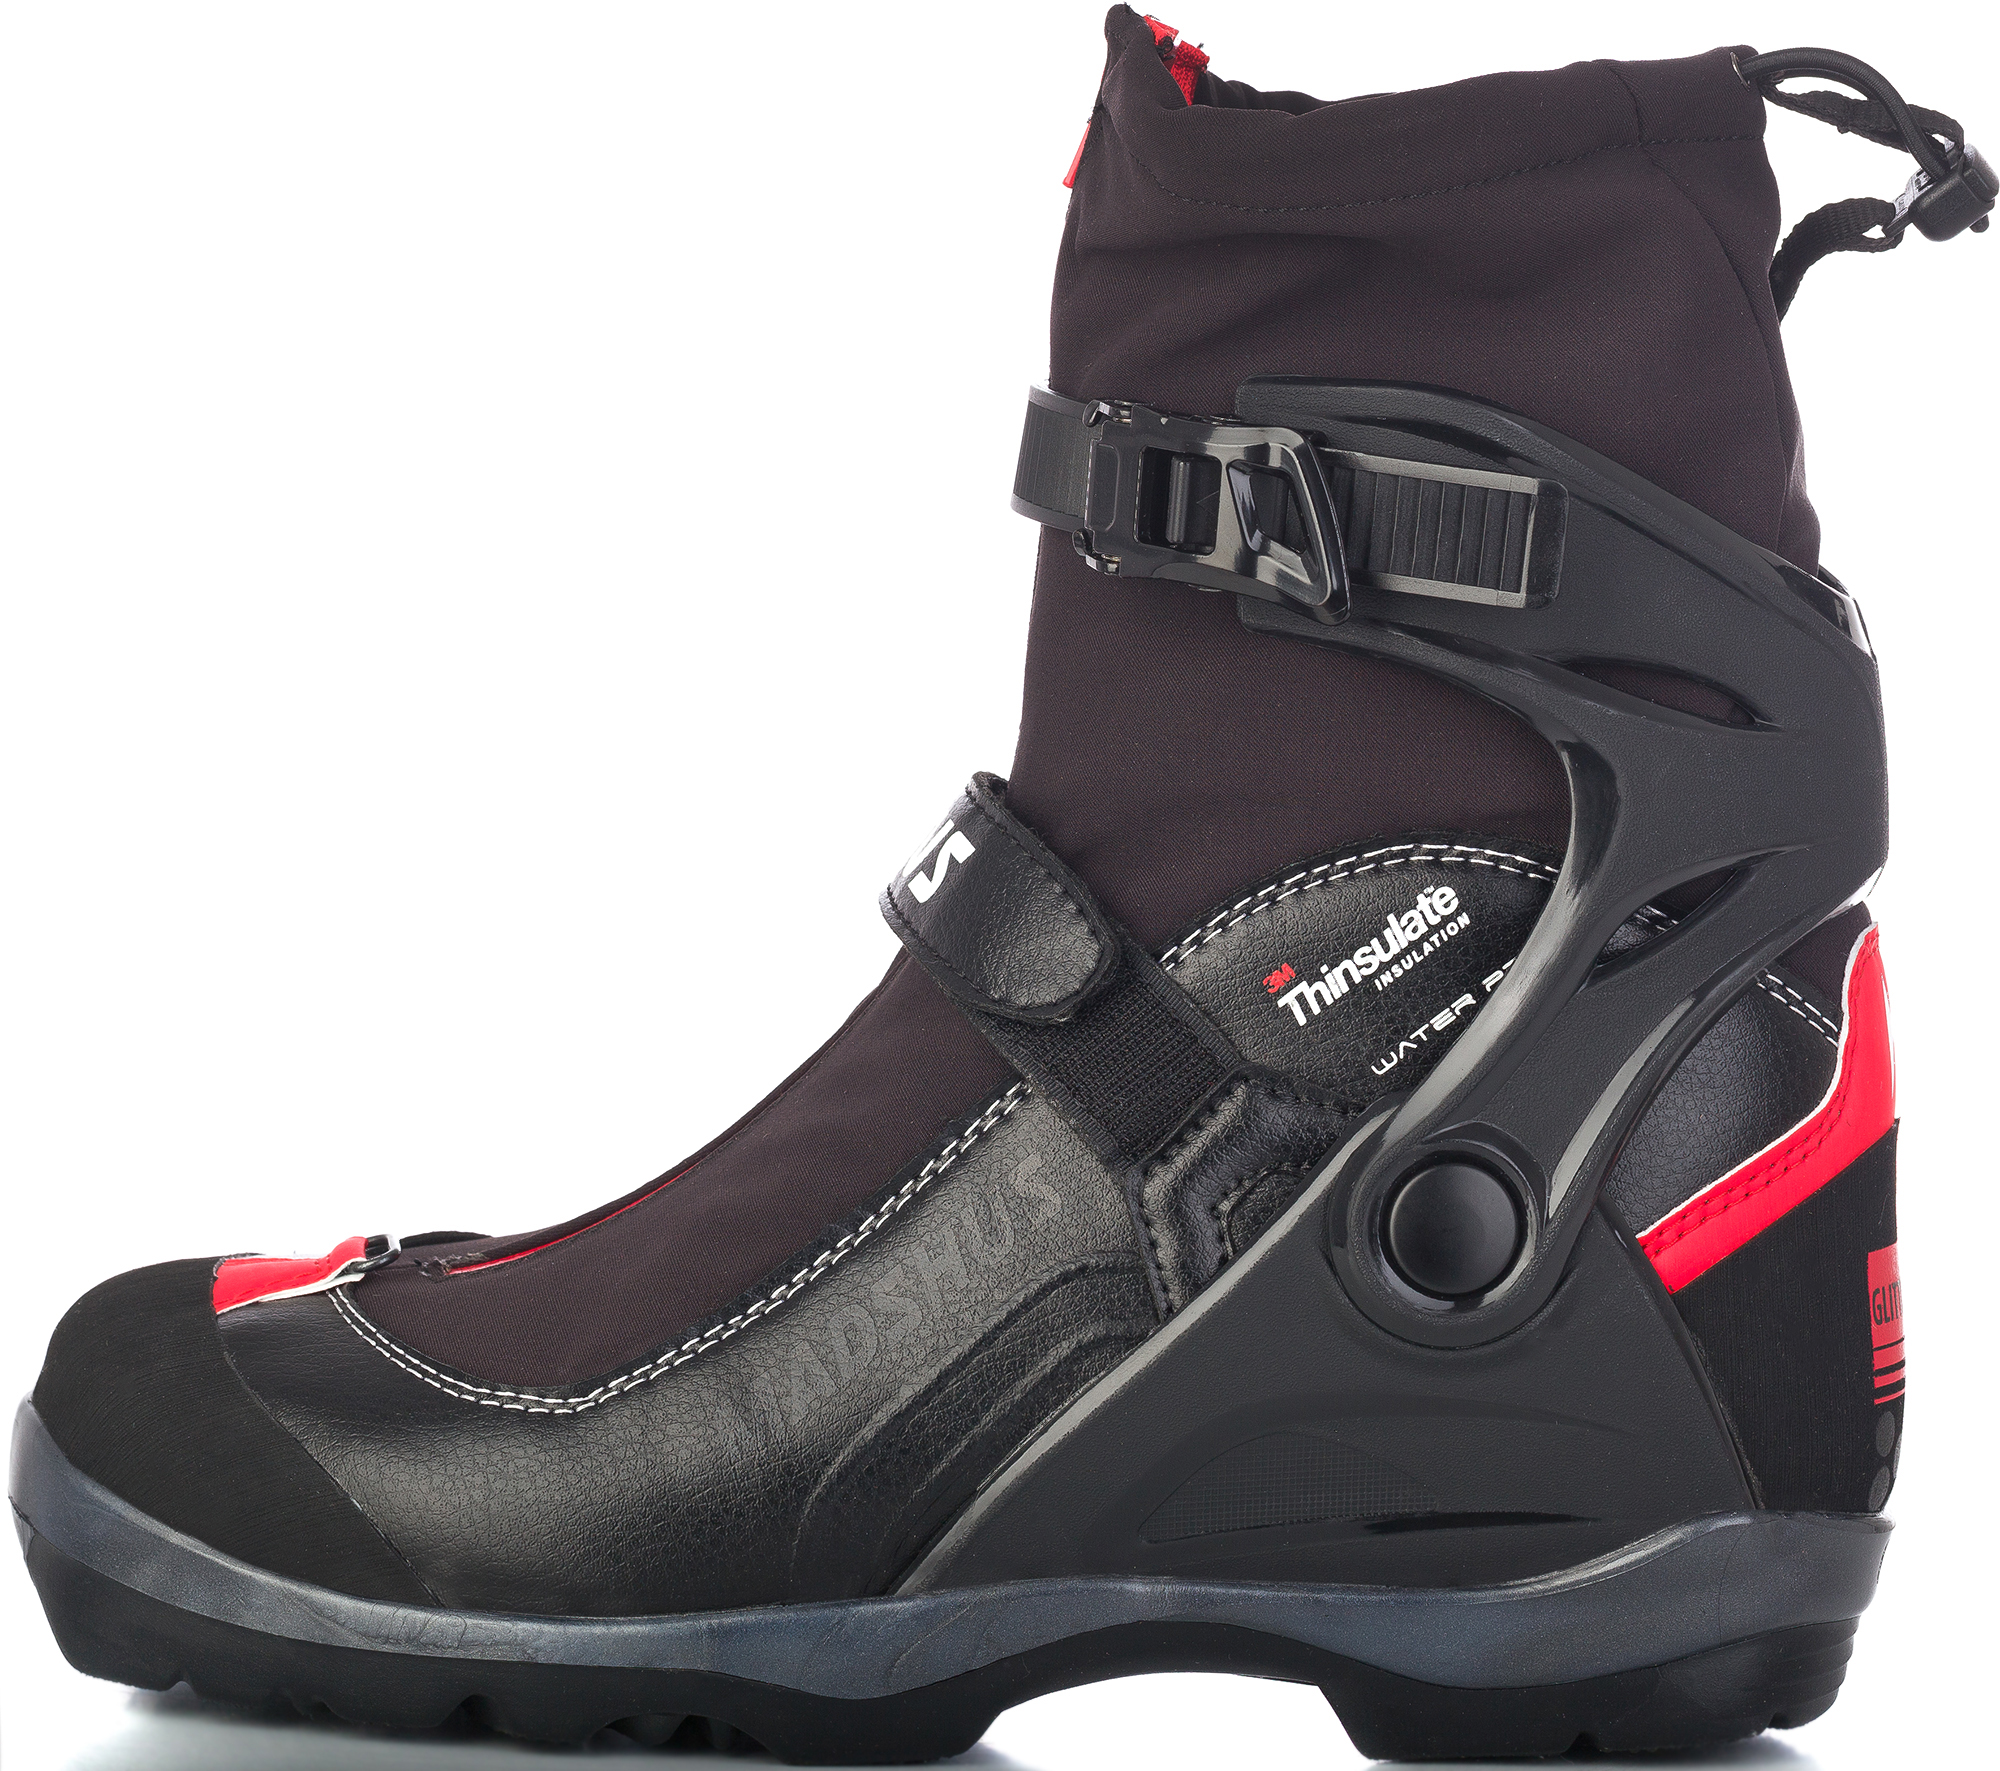 цена на Madshus Ботинки для беговых лыж Madshus Glittertind BC